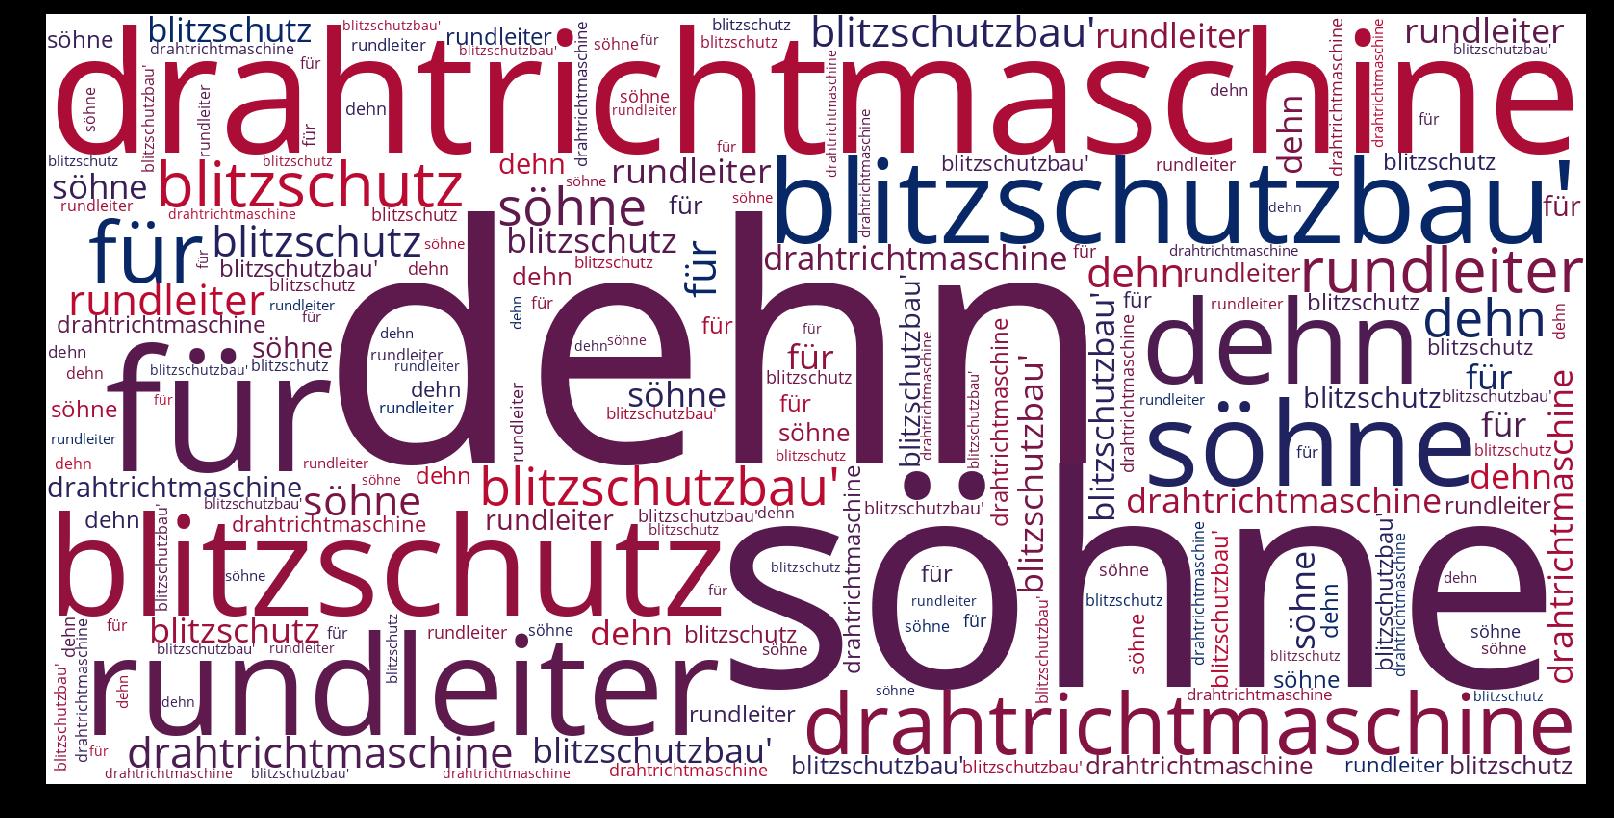 Drahtrichtmaschine-wordcloud